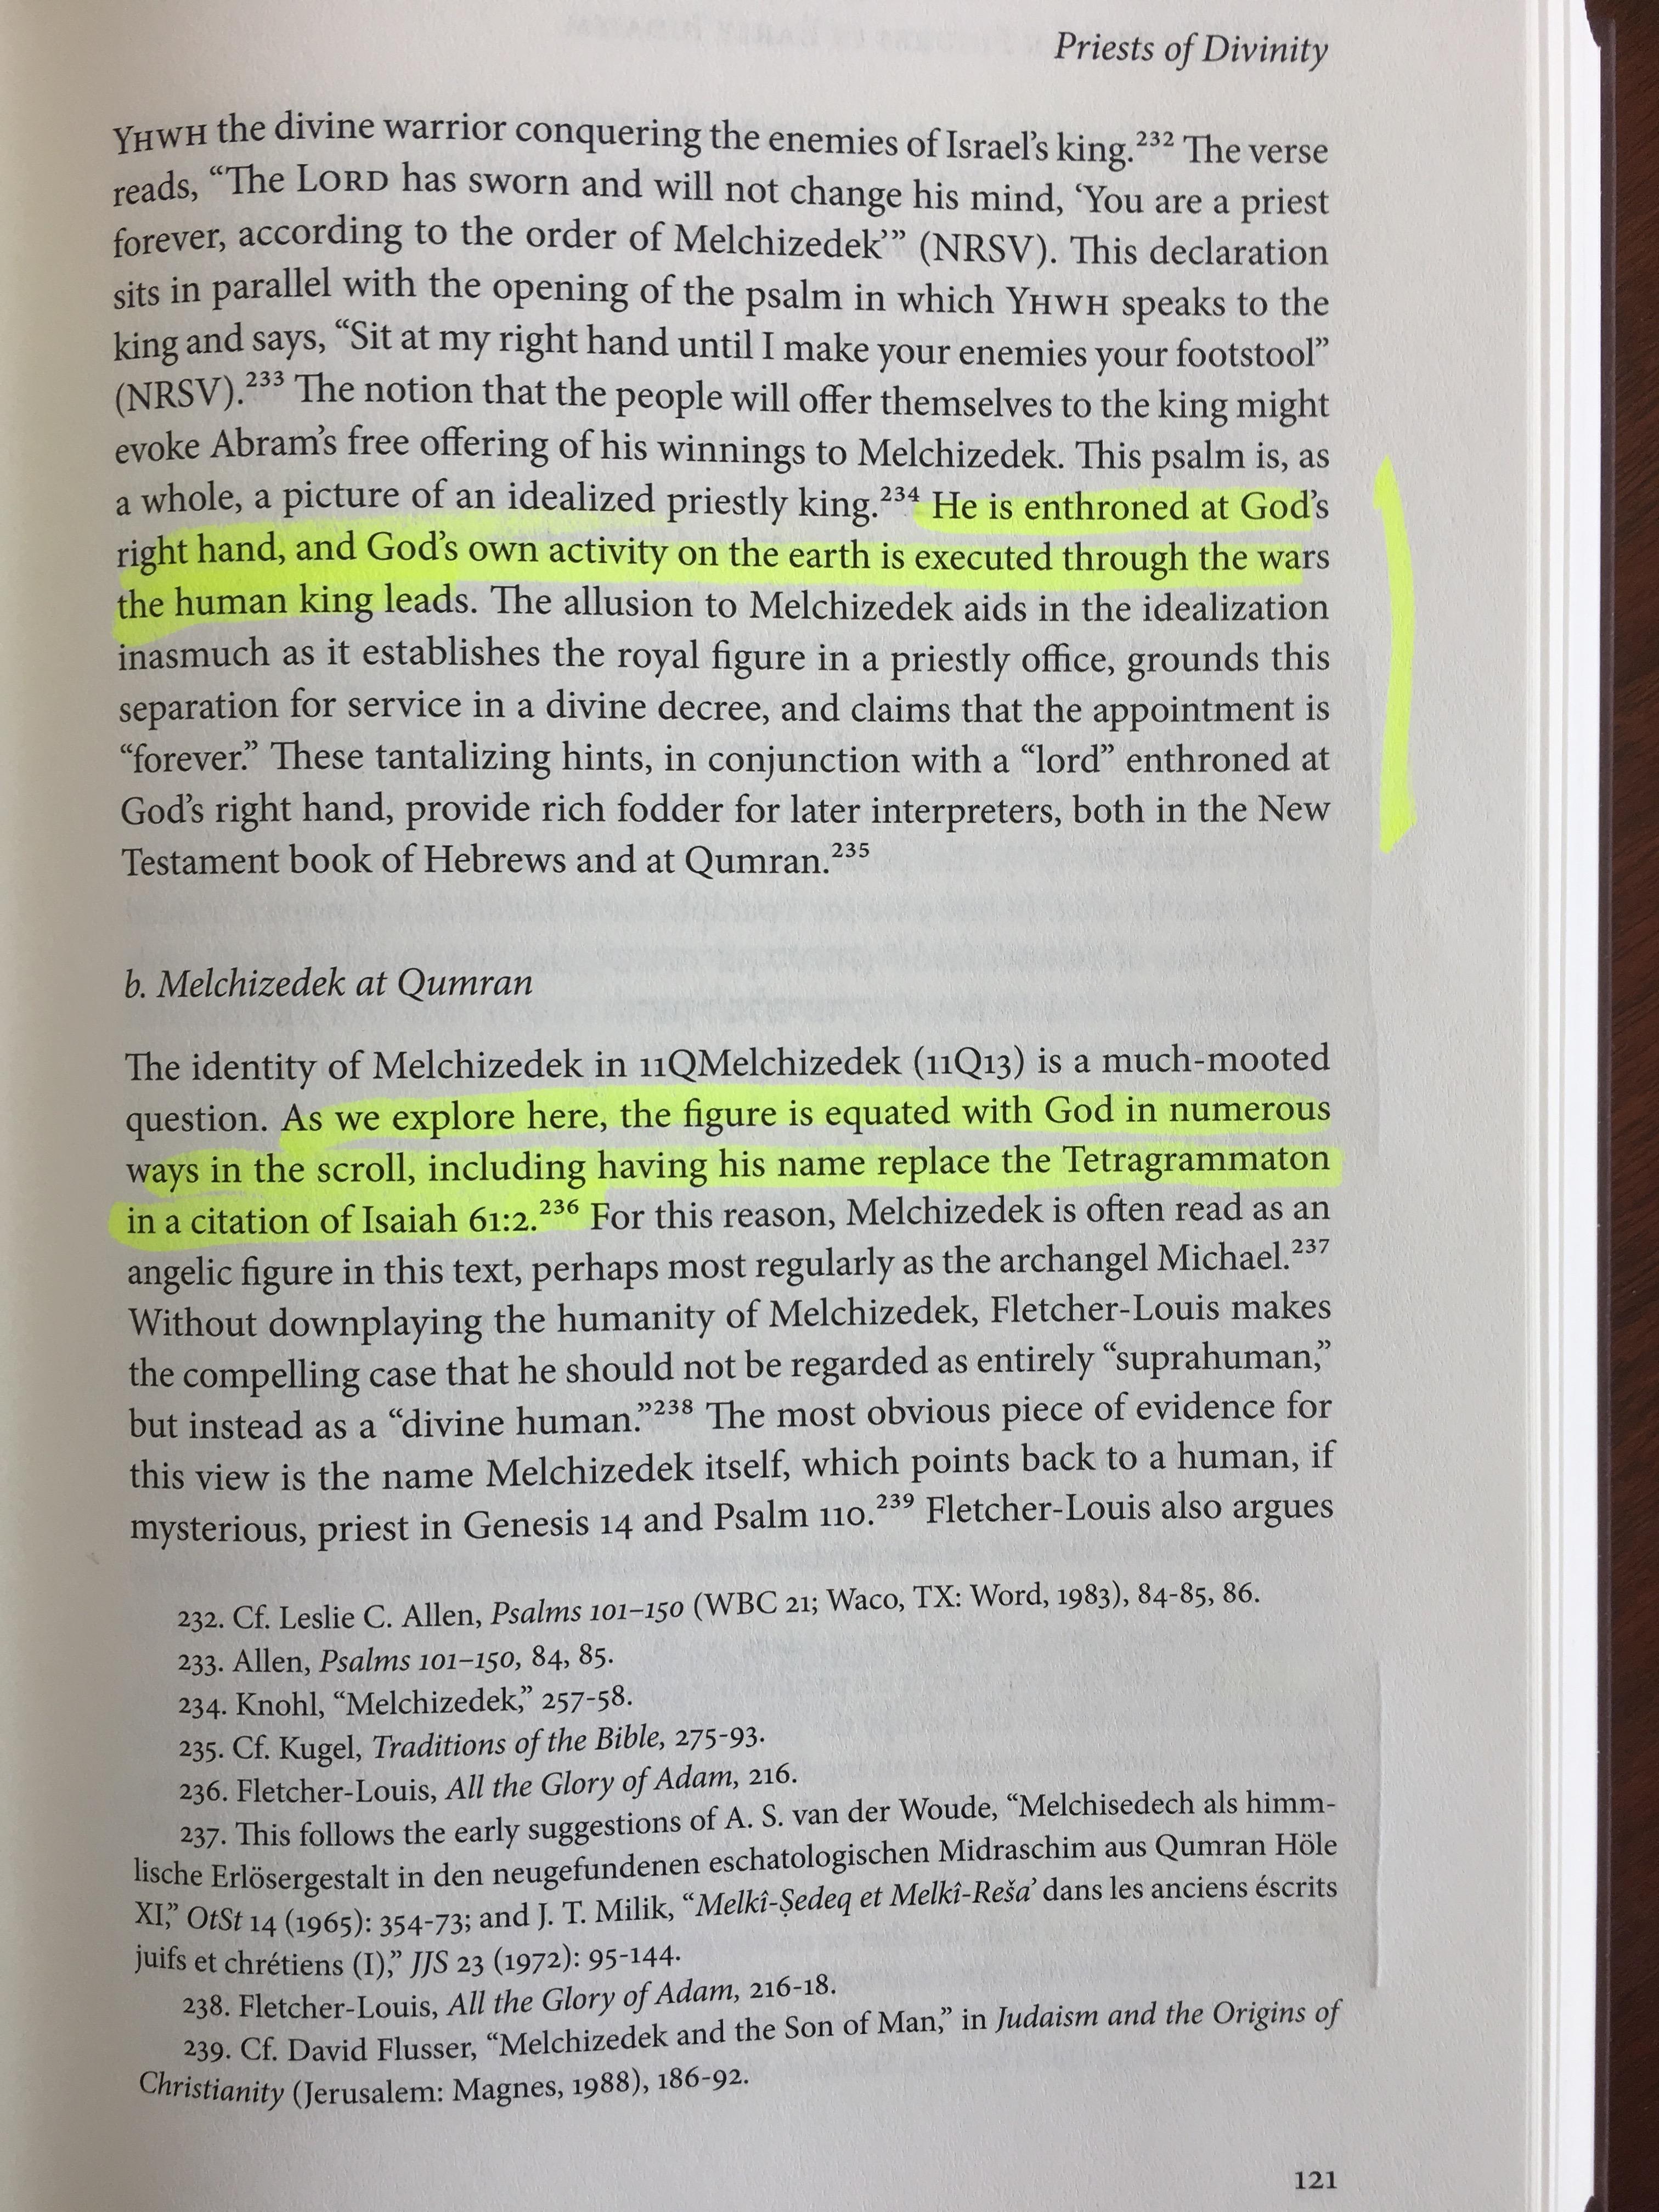 Melchizedek is called Yahweh in the Dead Sea Scrolls